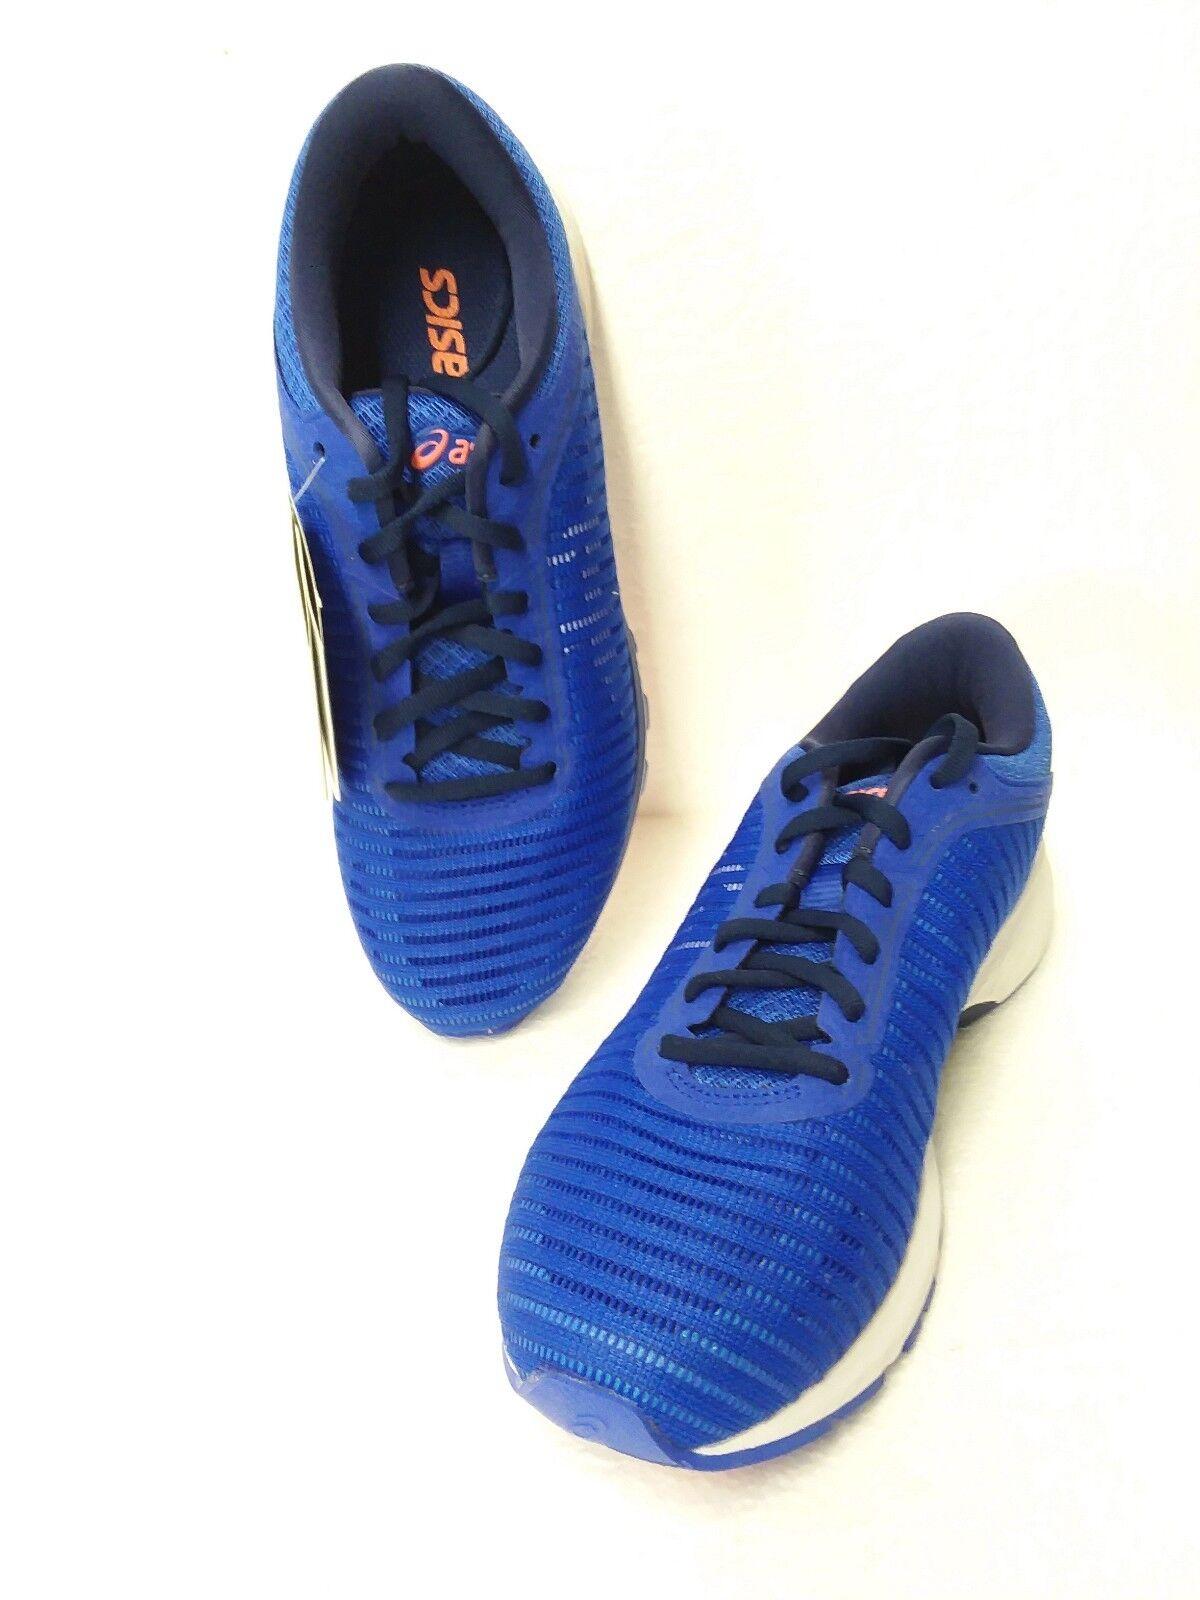 Damens' s Asics Dynaflyte 2 , Blau Purple / WEISS / Indigo Blau , Größe; 7.5